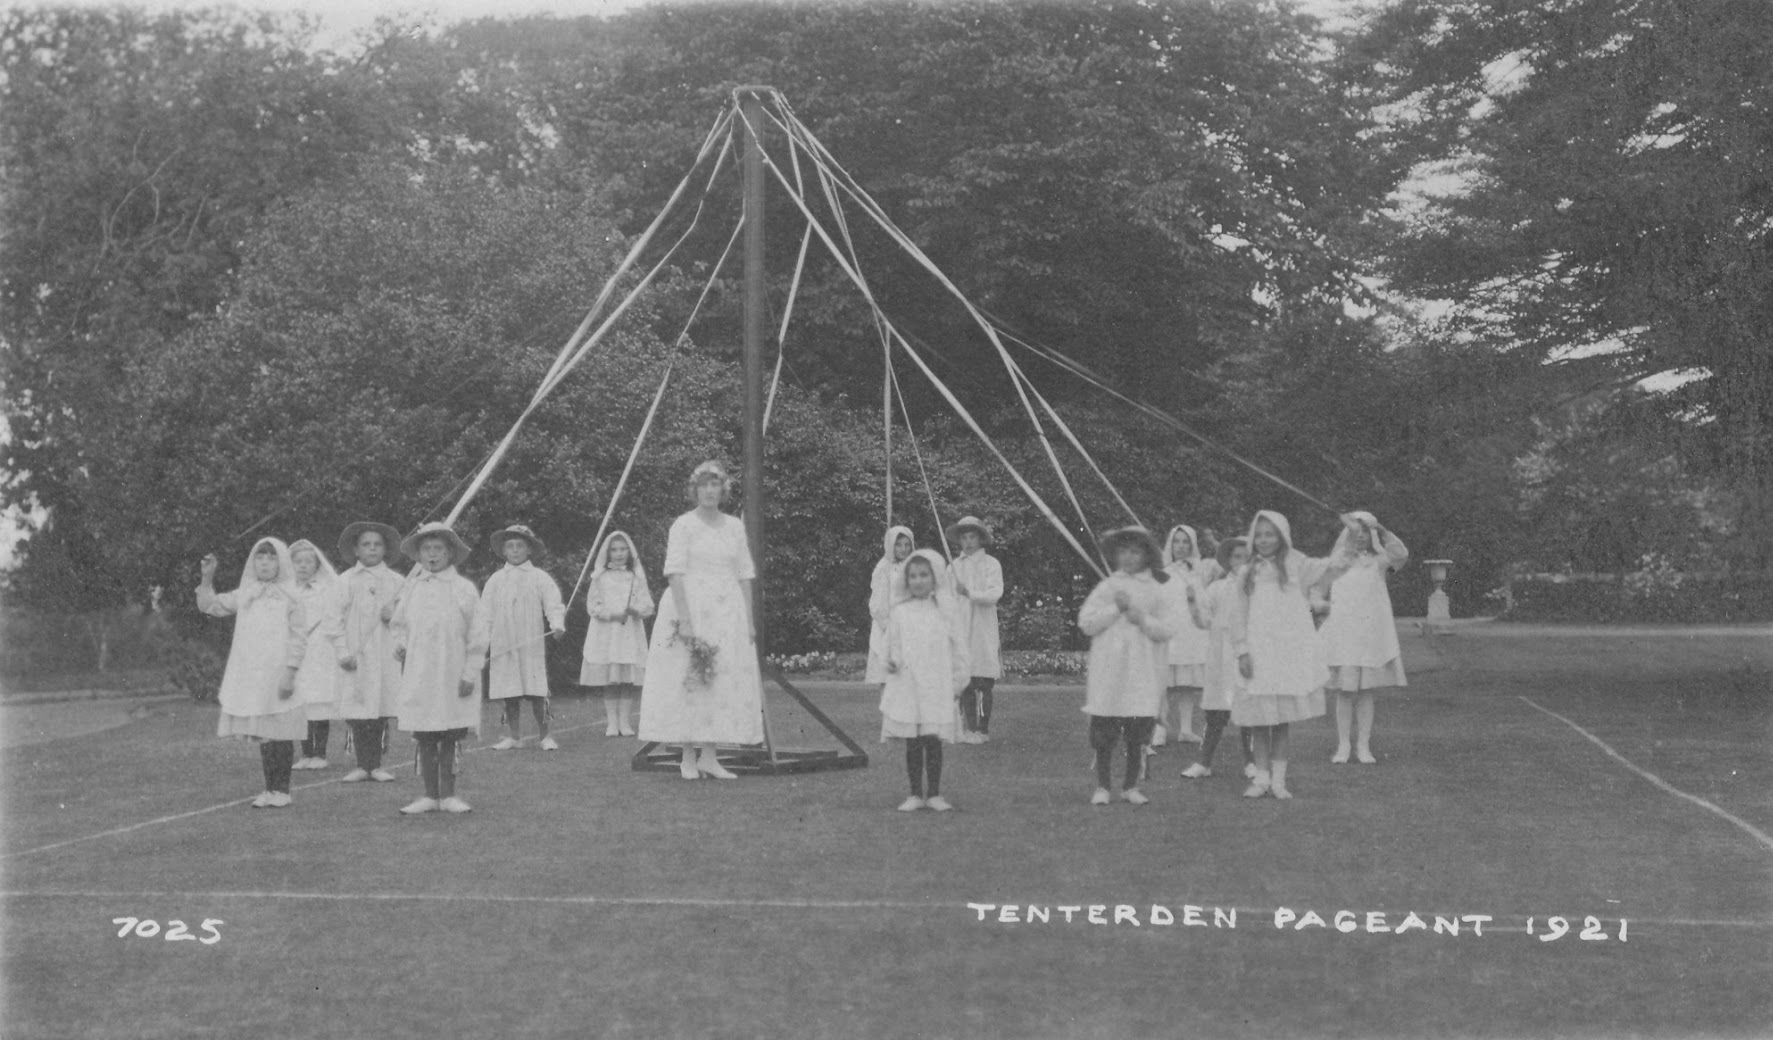 Tenterden Pageant 1921